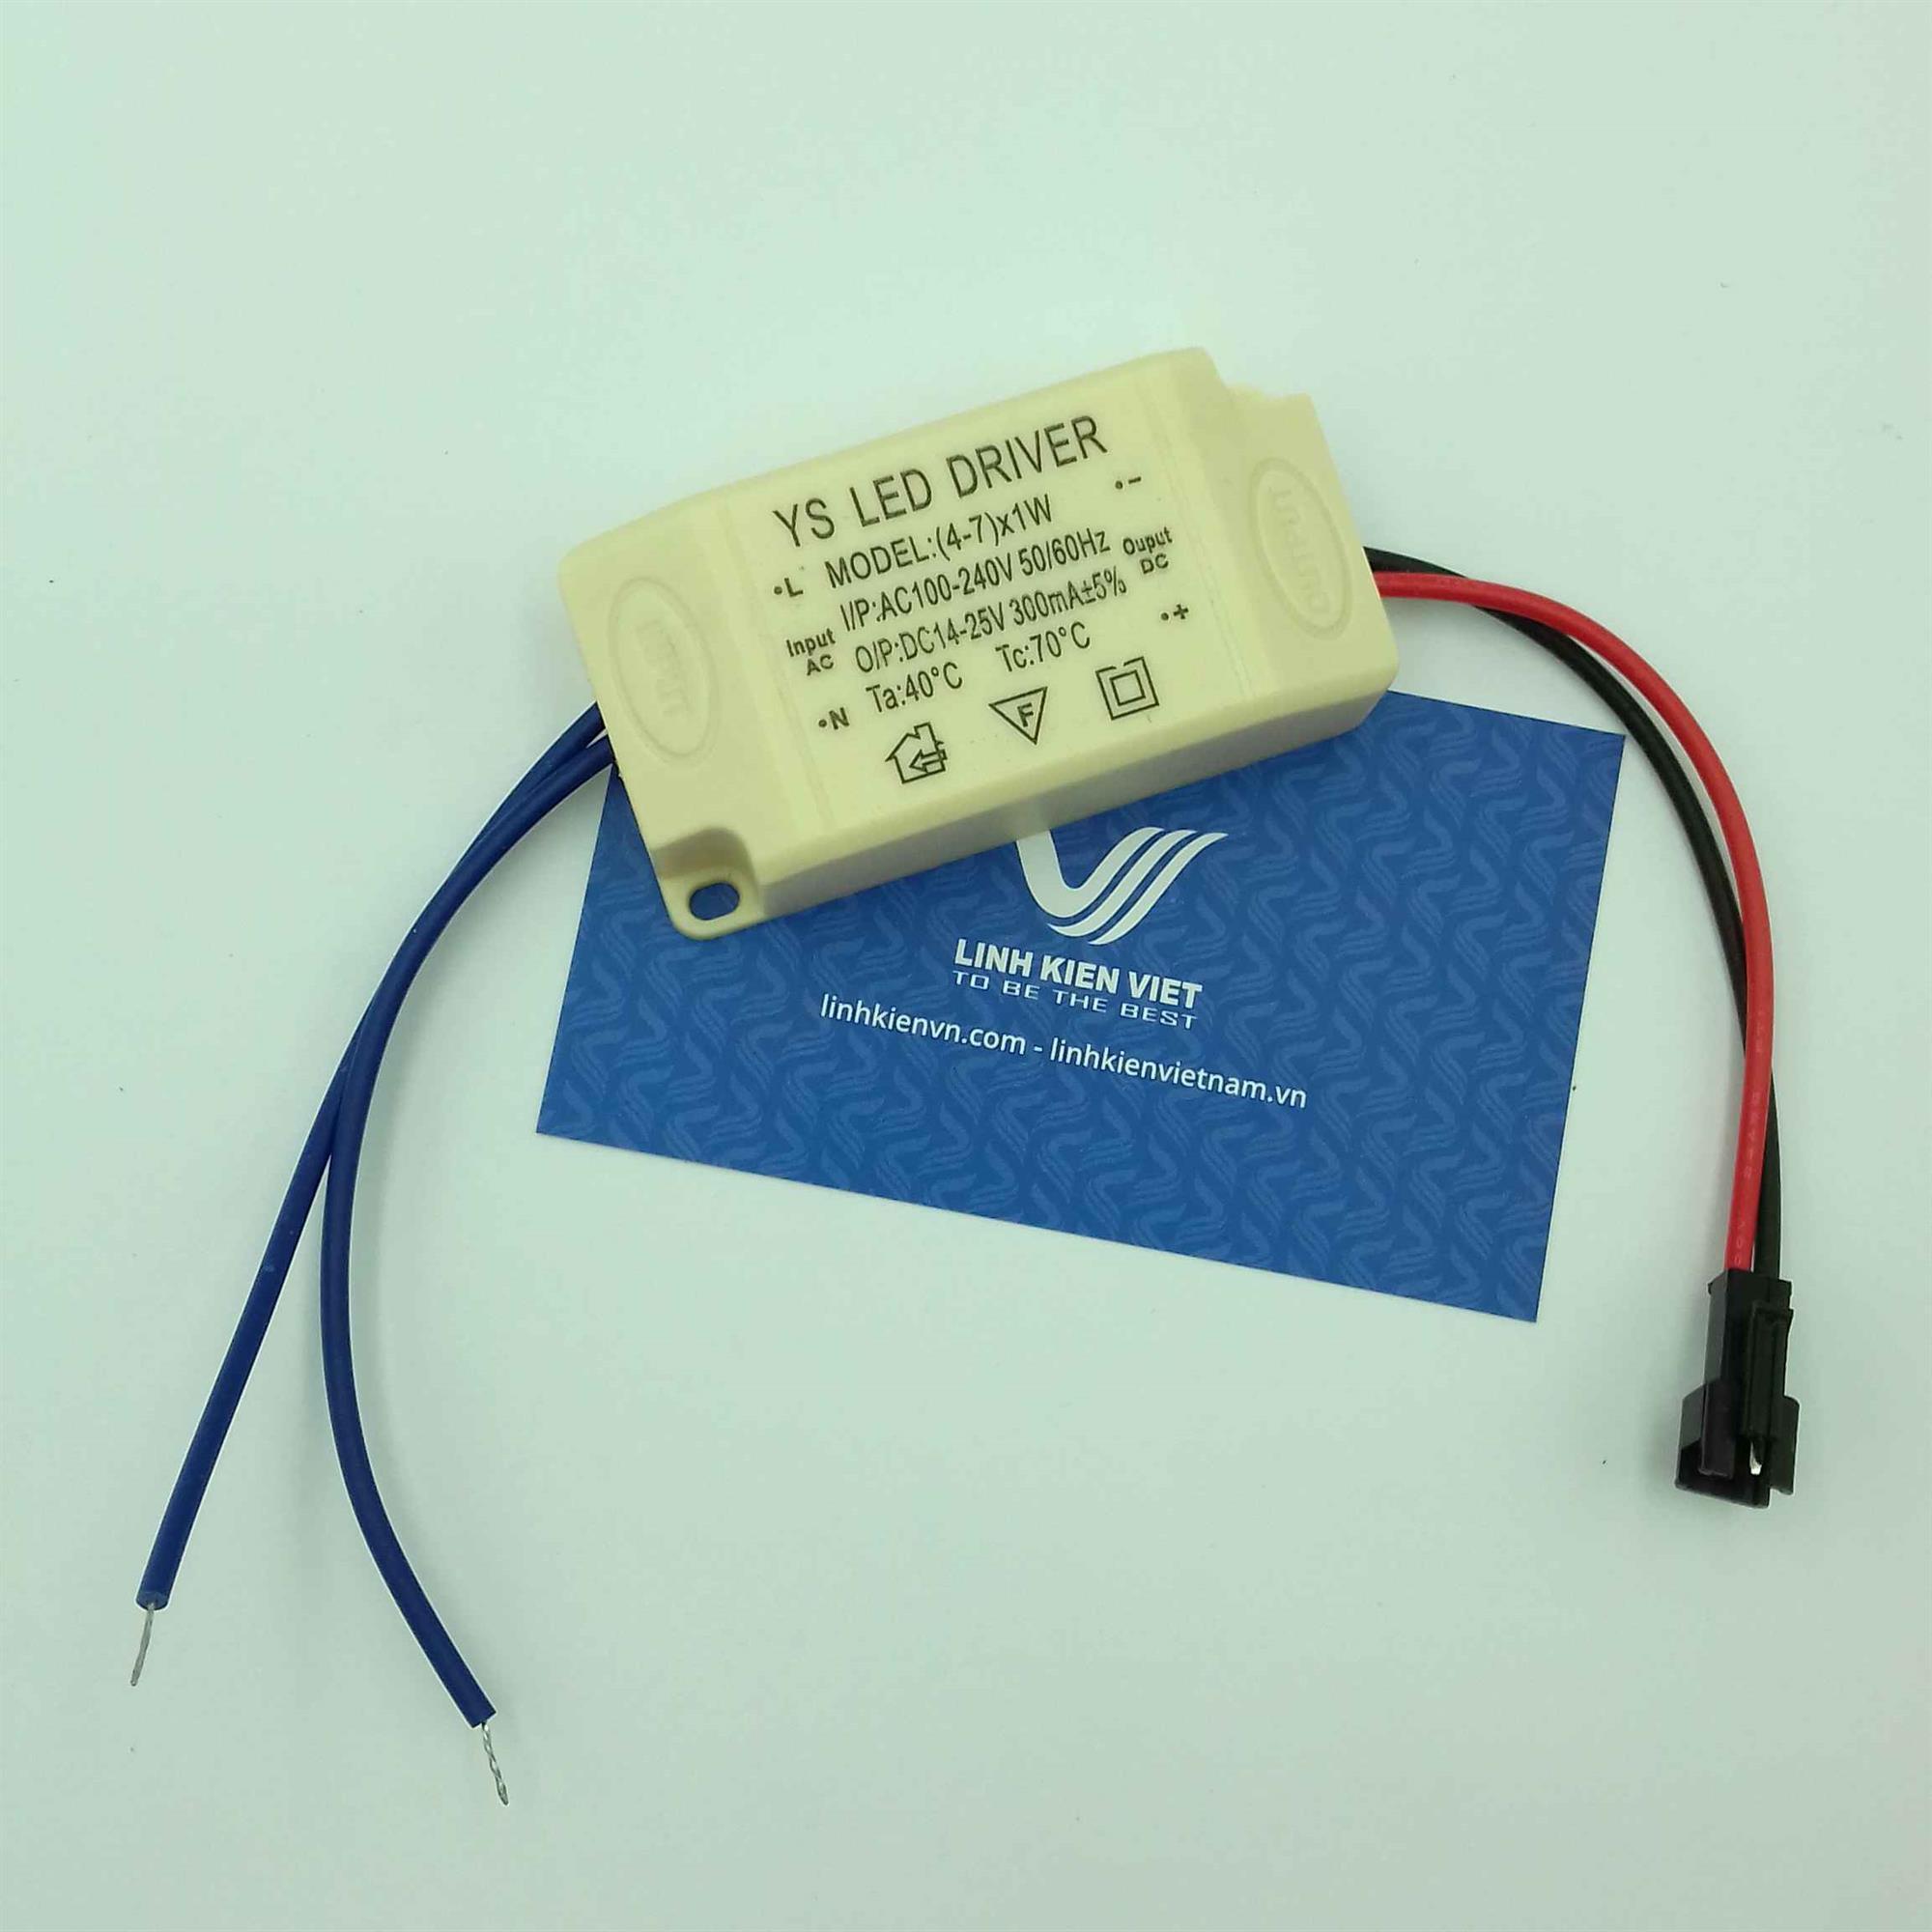 Nguồn driver cho led luxeon 1w-7w / Nguồn driver LED / Led Driver 7x1W - i2H2 (KB10H3)